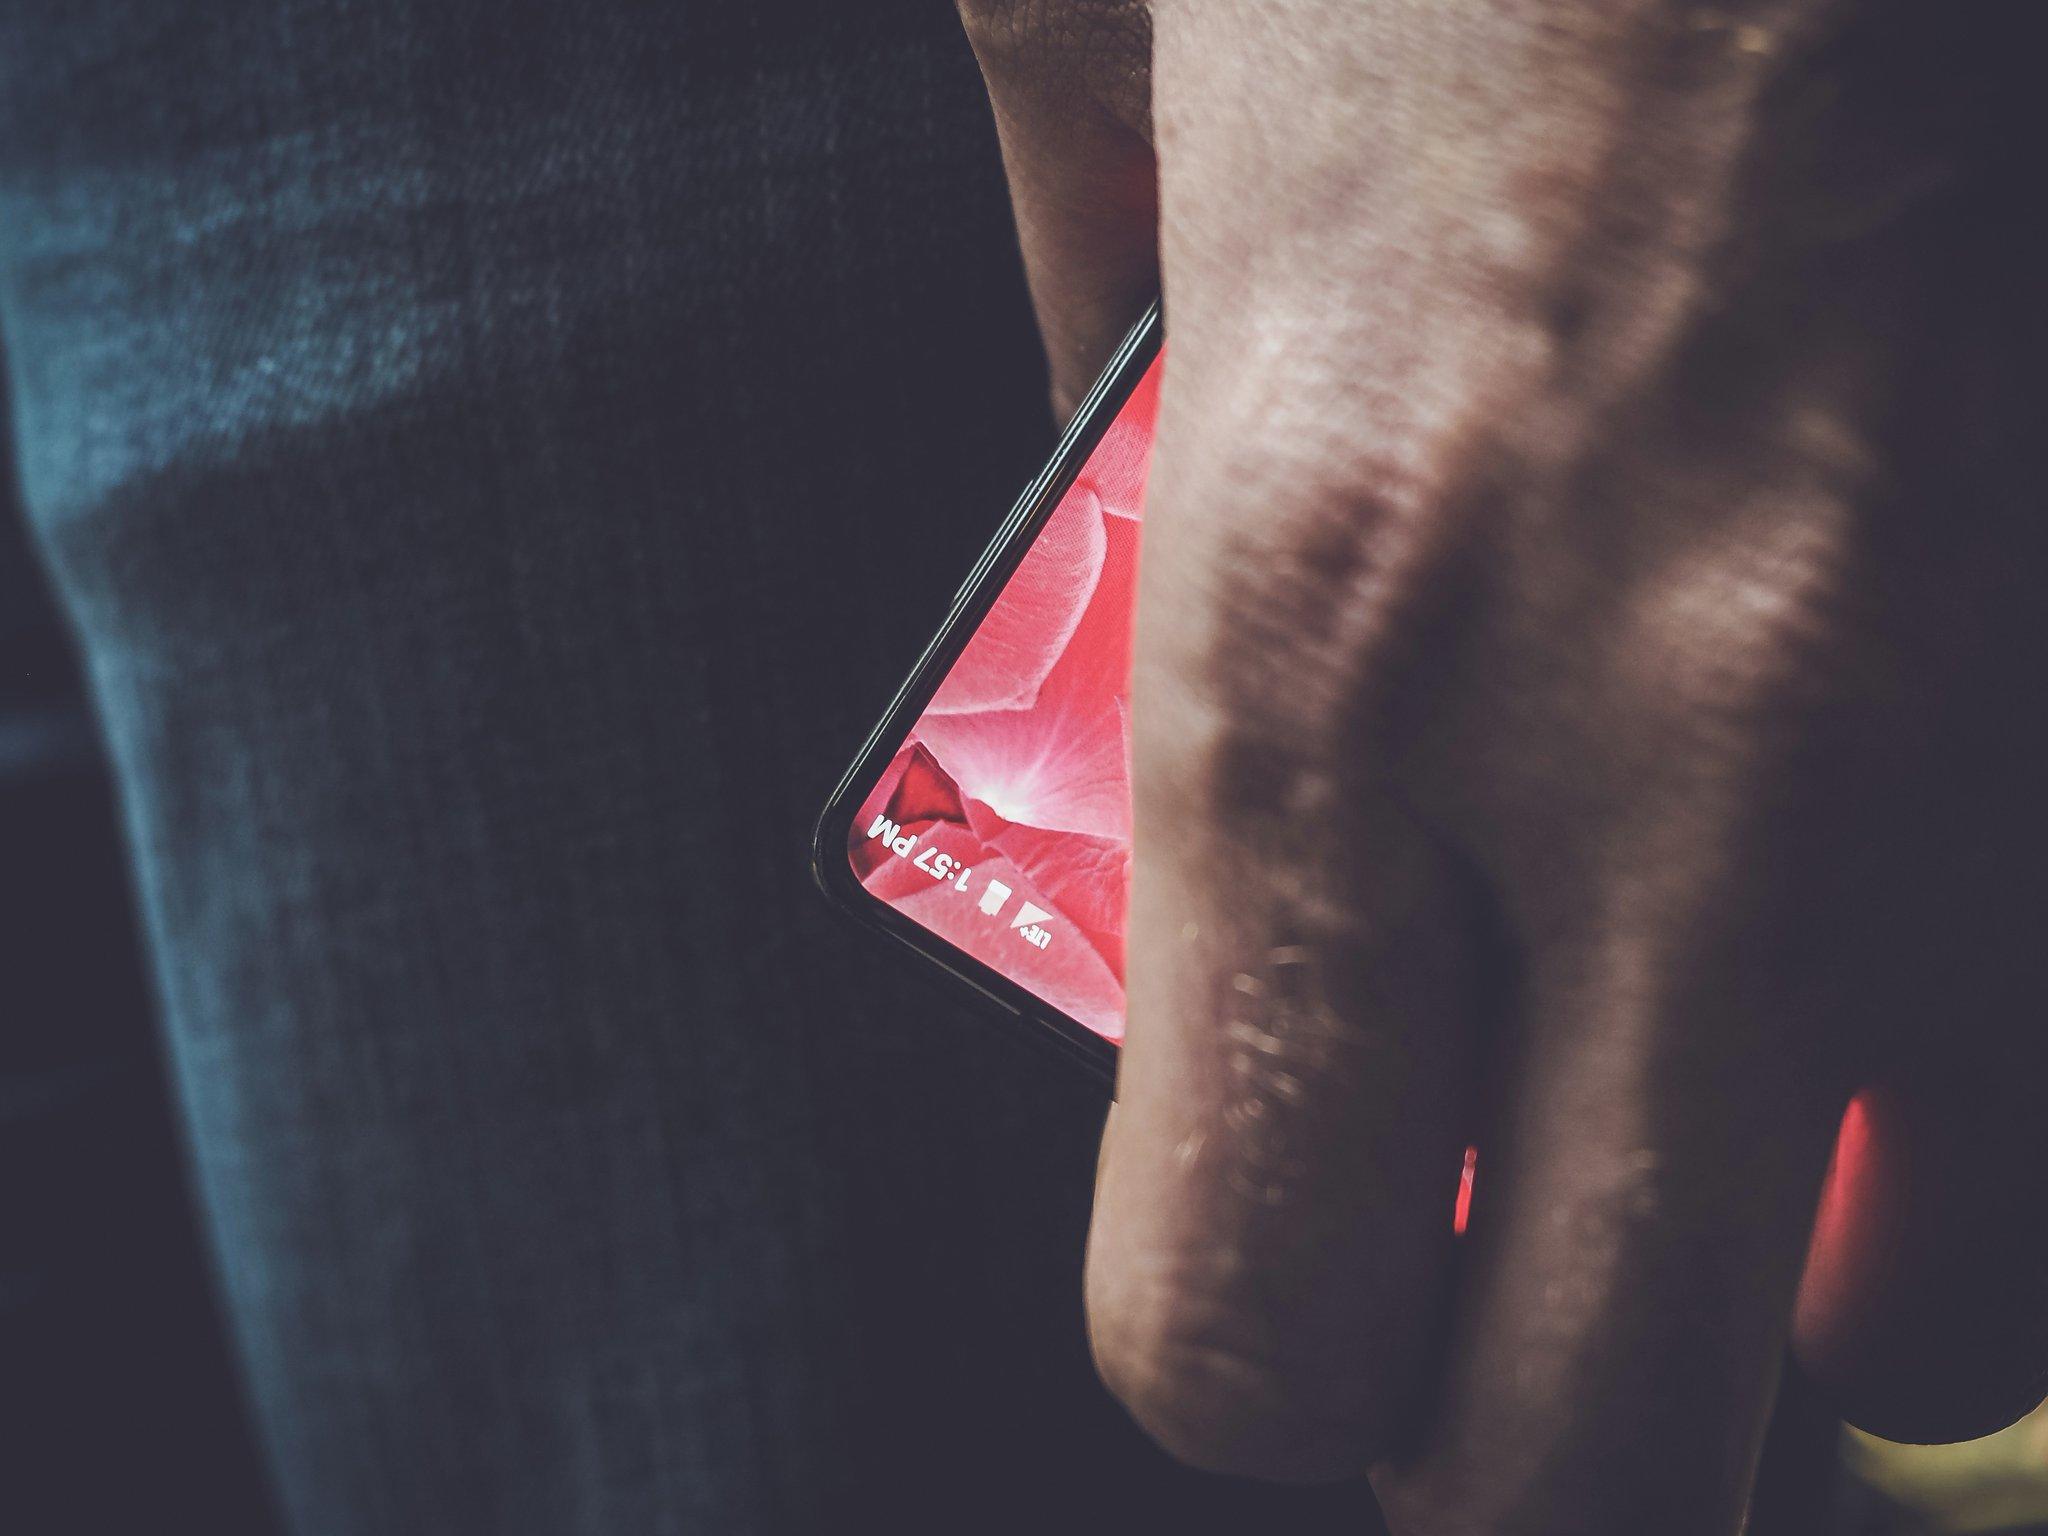 Essential-Modular-Phone.jpg